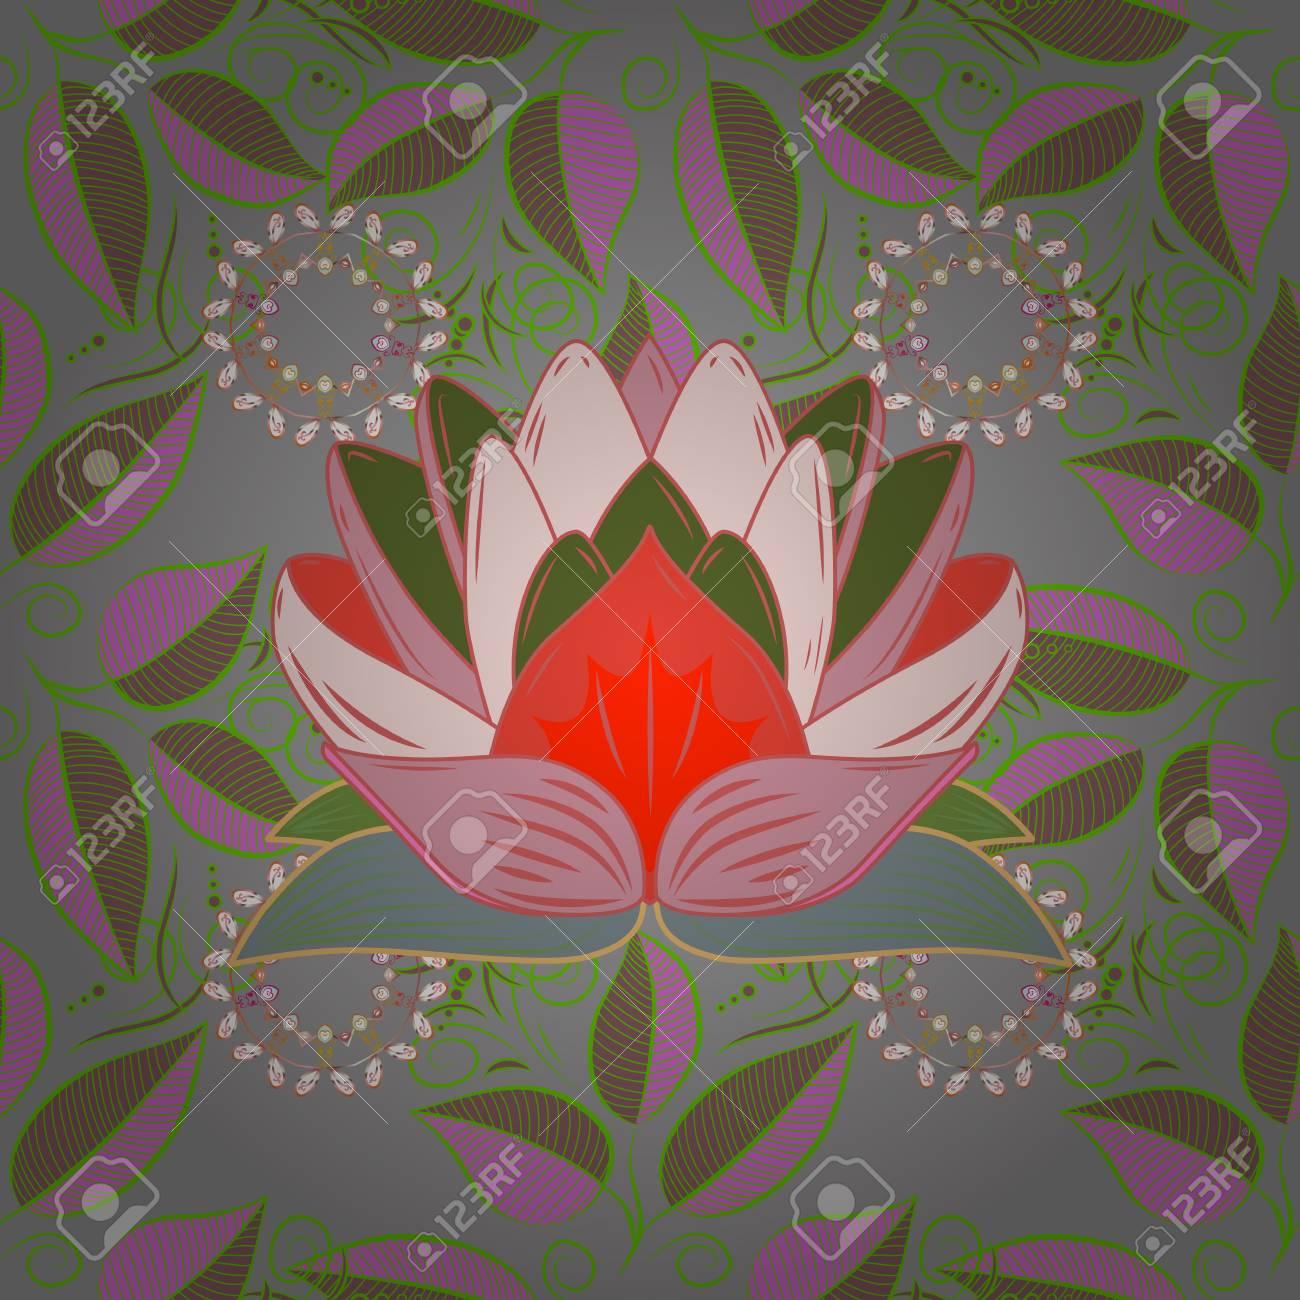 Flower painting raster for t shirt printing floral seamless flower painting raster for t shirt printing floral seamless pattern background flowers on gray izmirmasajfo